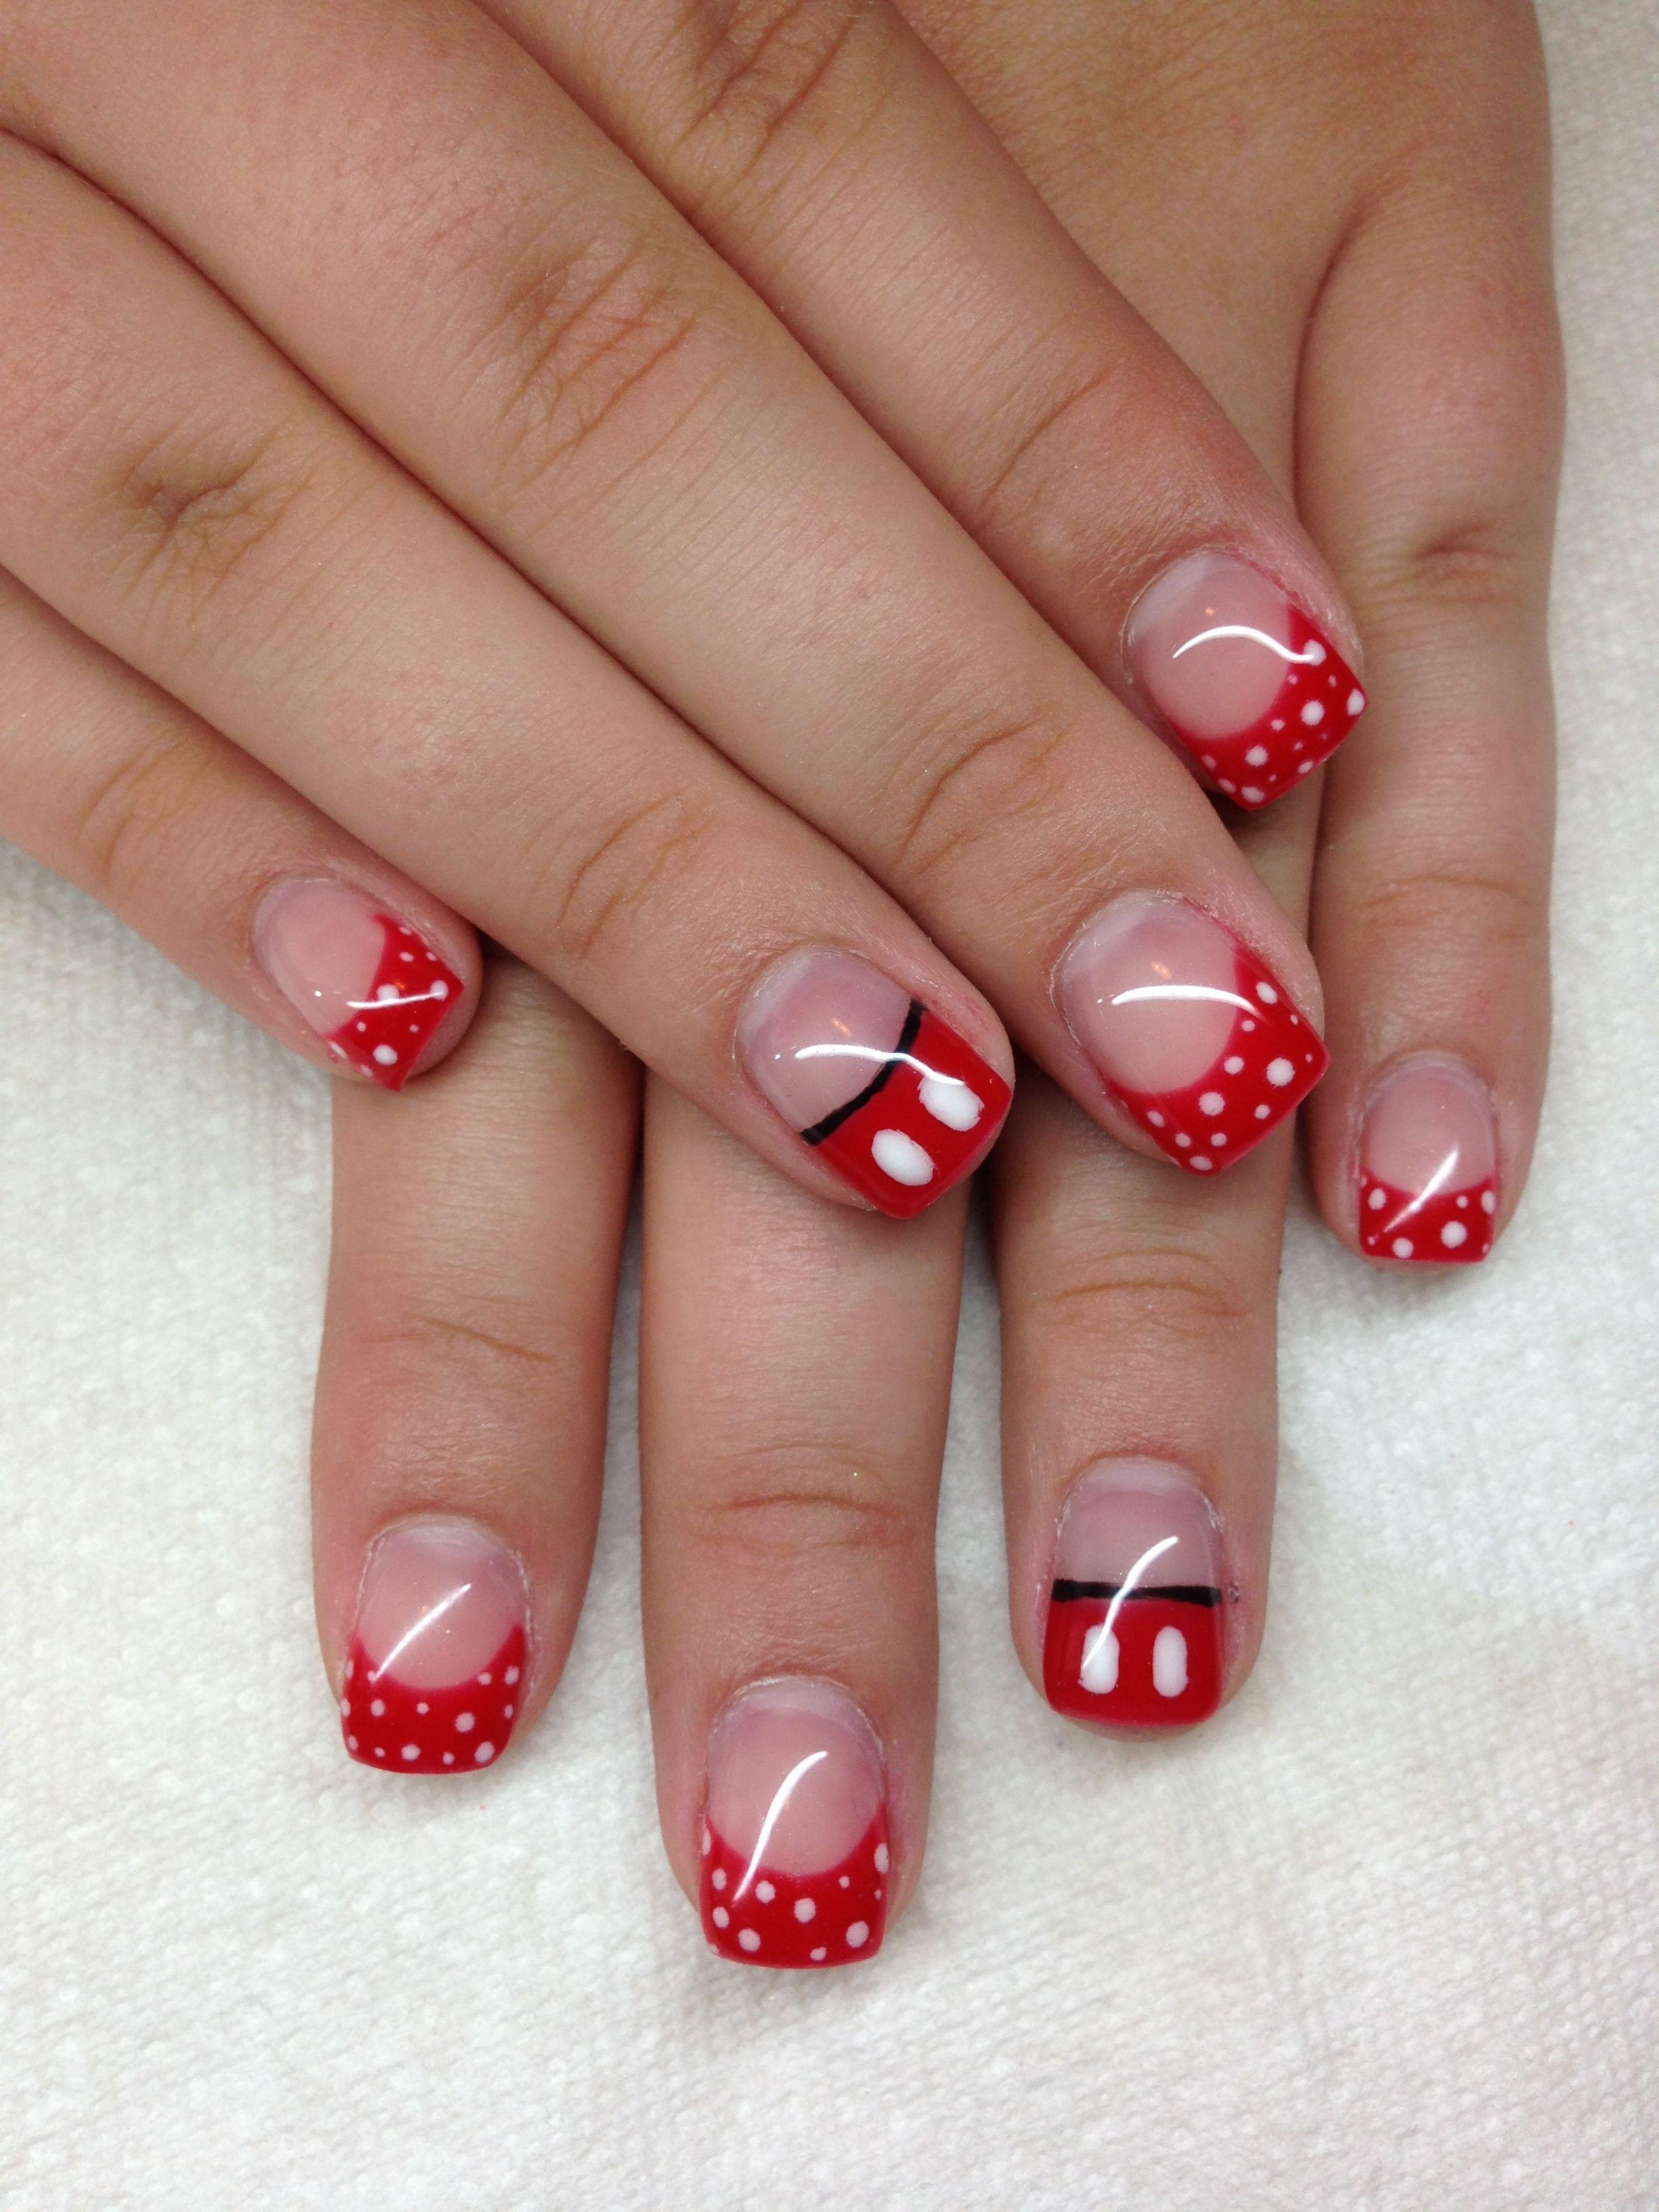 Gel nails with hand drawn design using gel By Melissa Fox